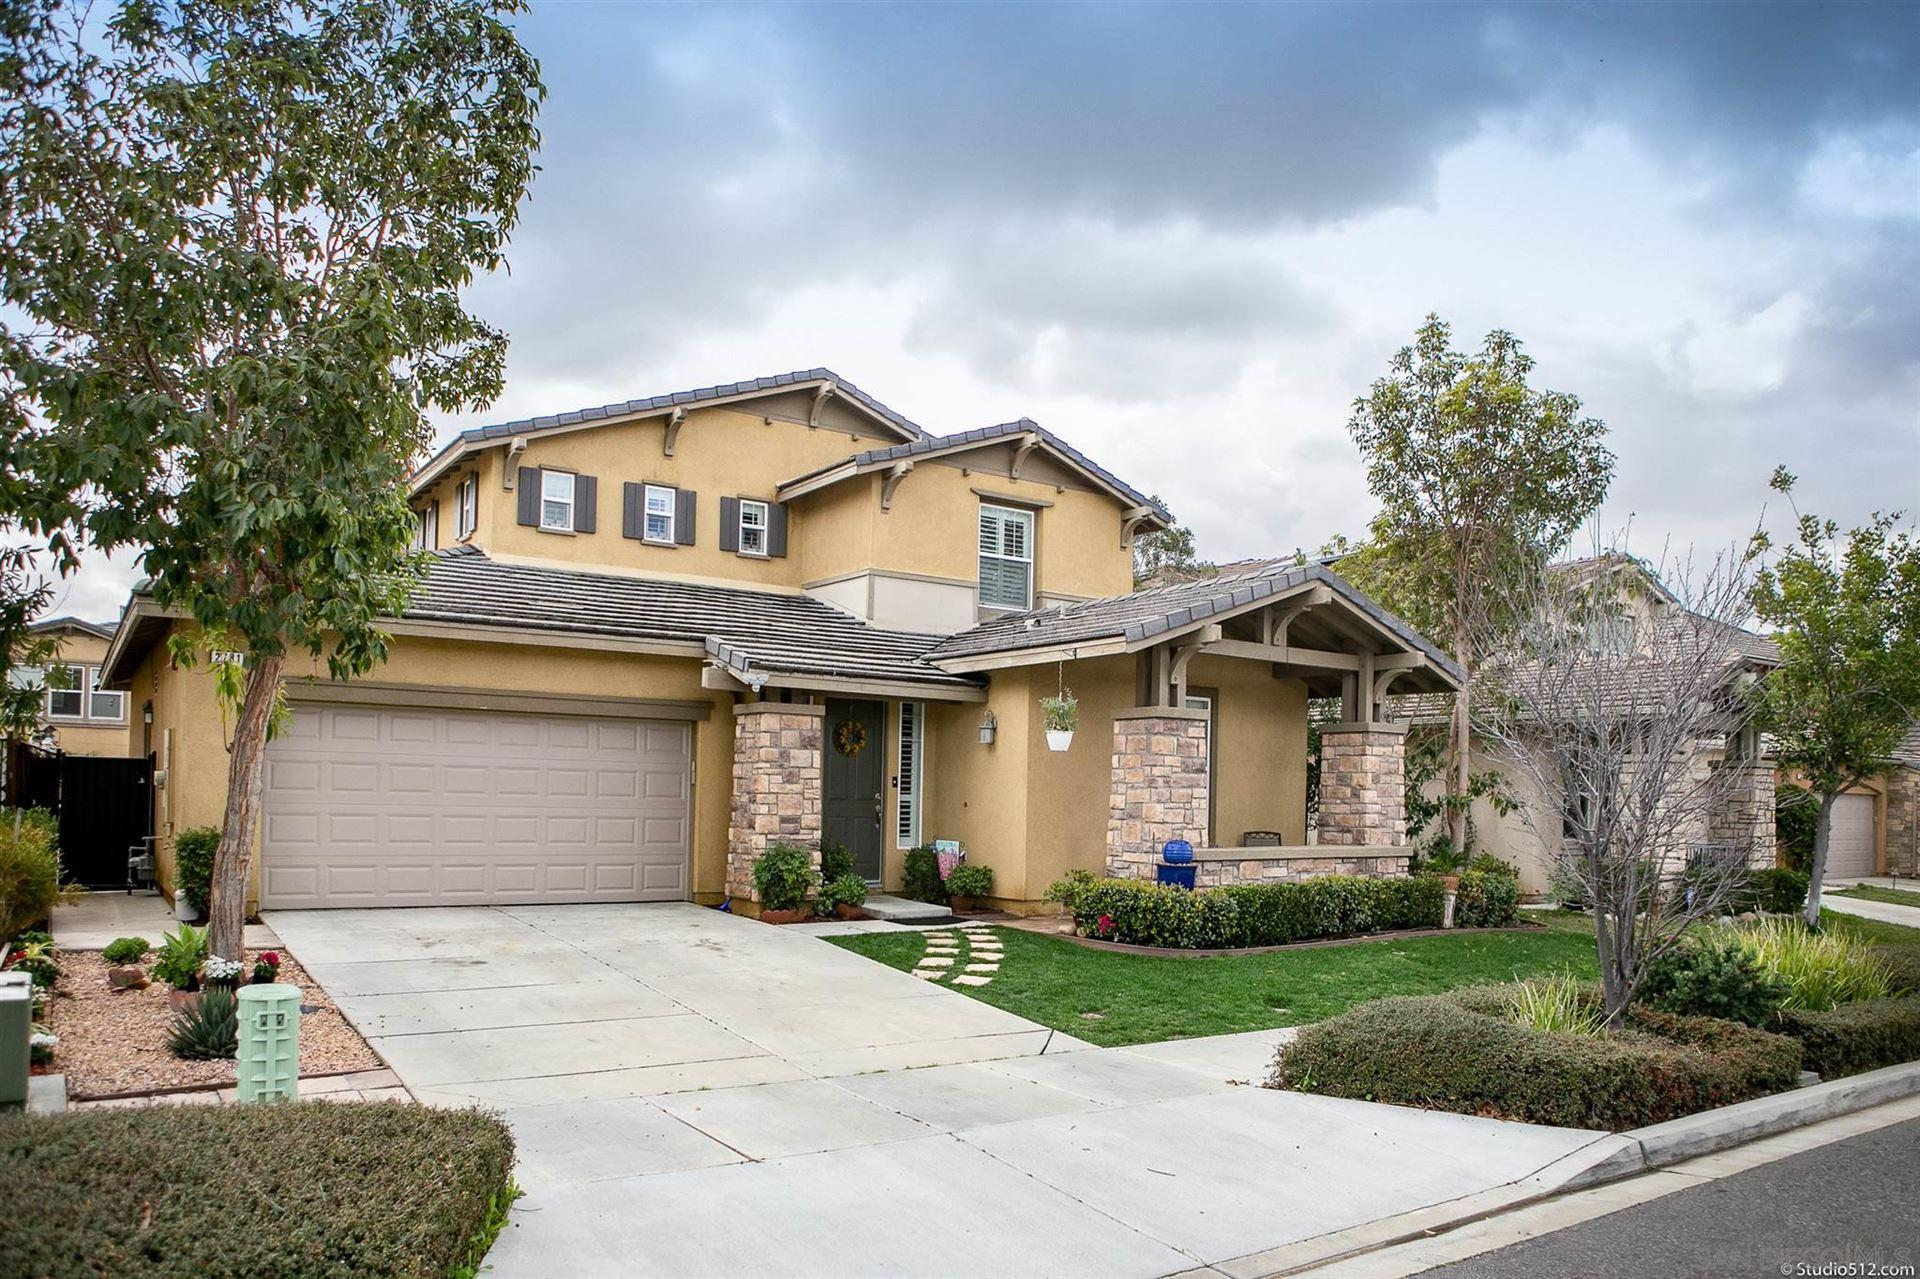 Photo of 2781 Morning Walk Ct, Escondido, CA 92027 (MLS # 210008508)